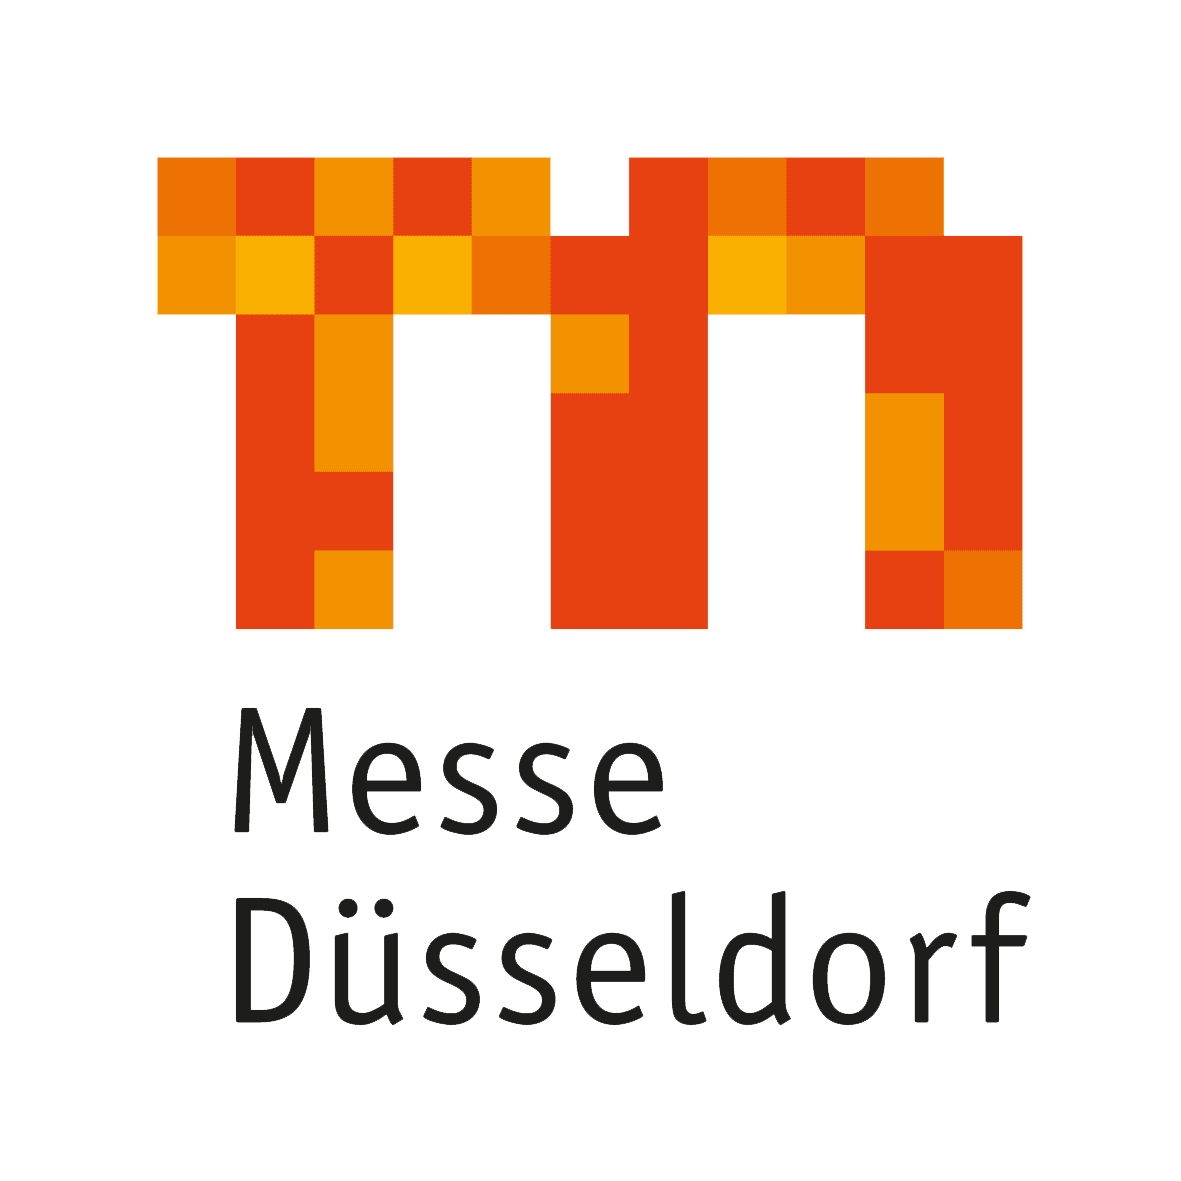 Messe | CCD, tulipinndusarena.com